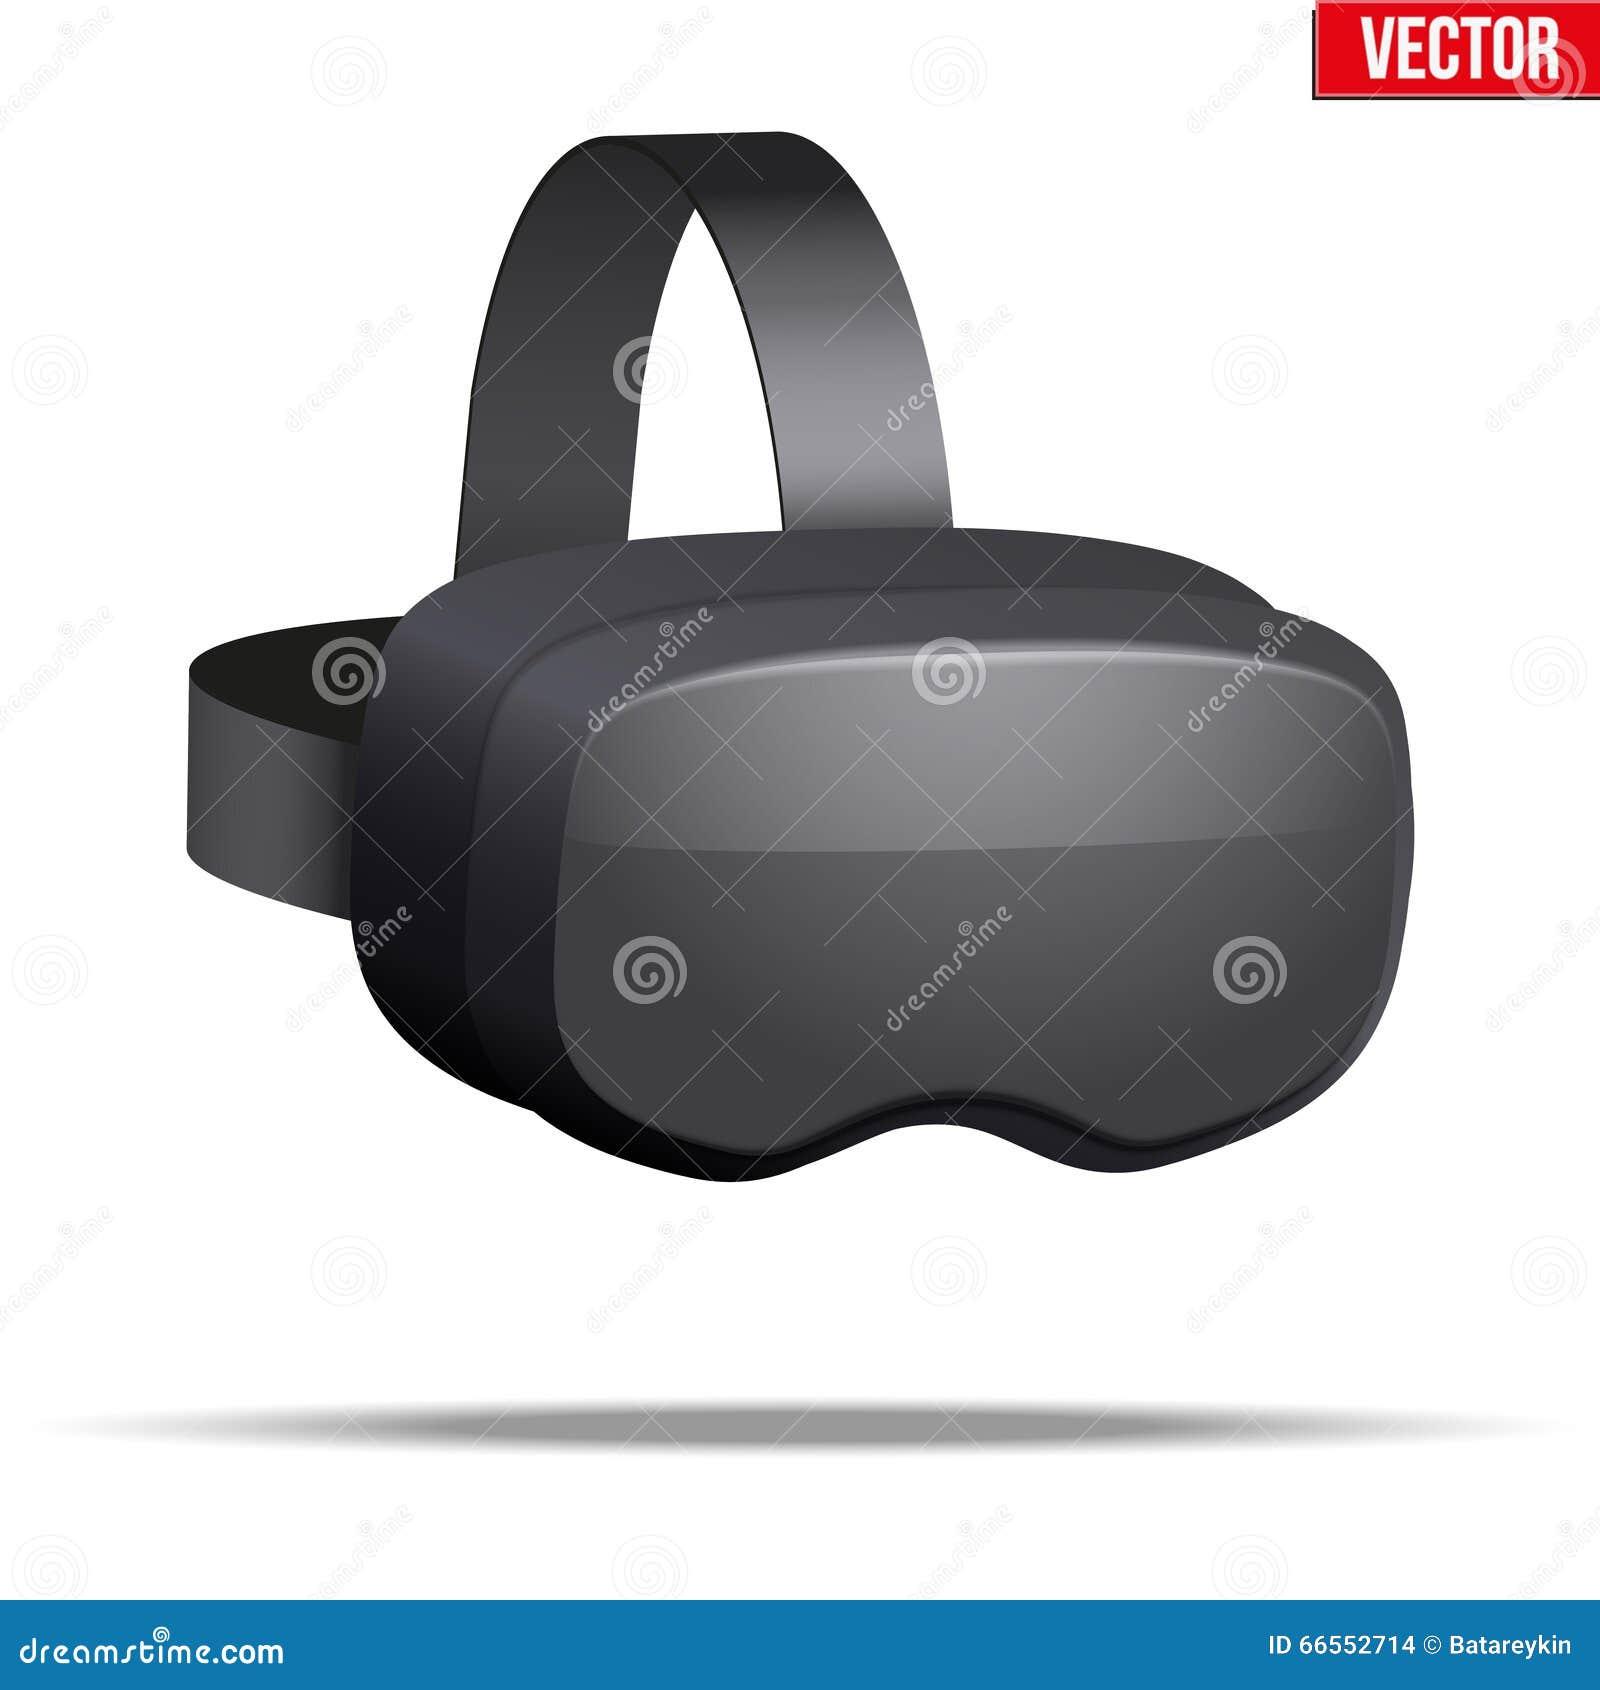 Originele 3d VR-hoofdtelefoon